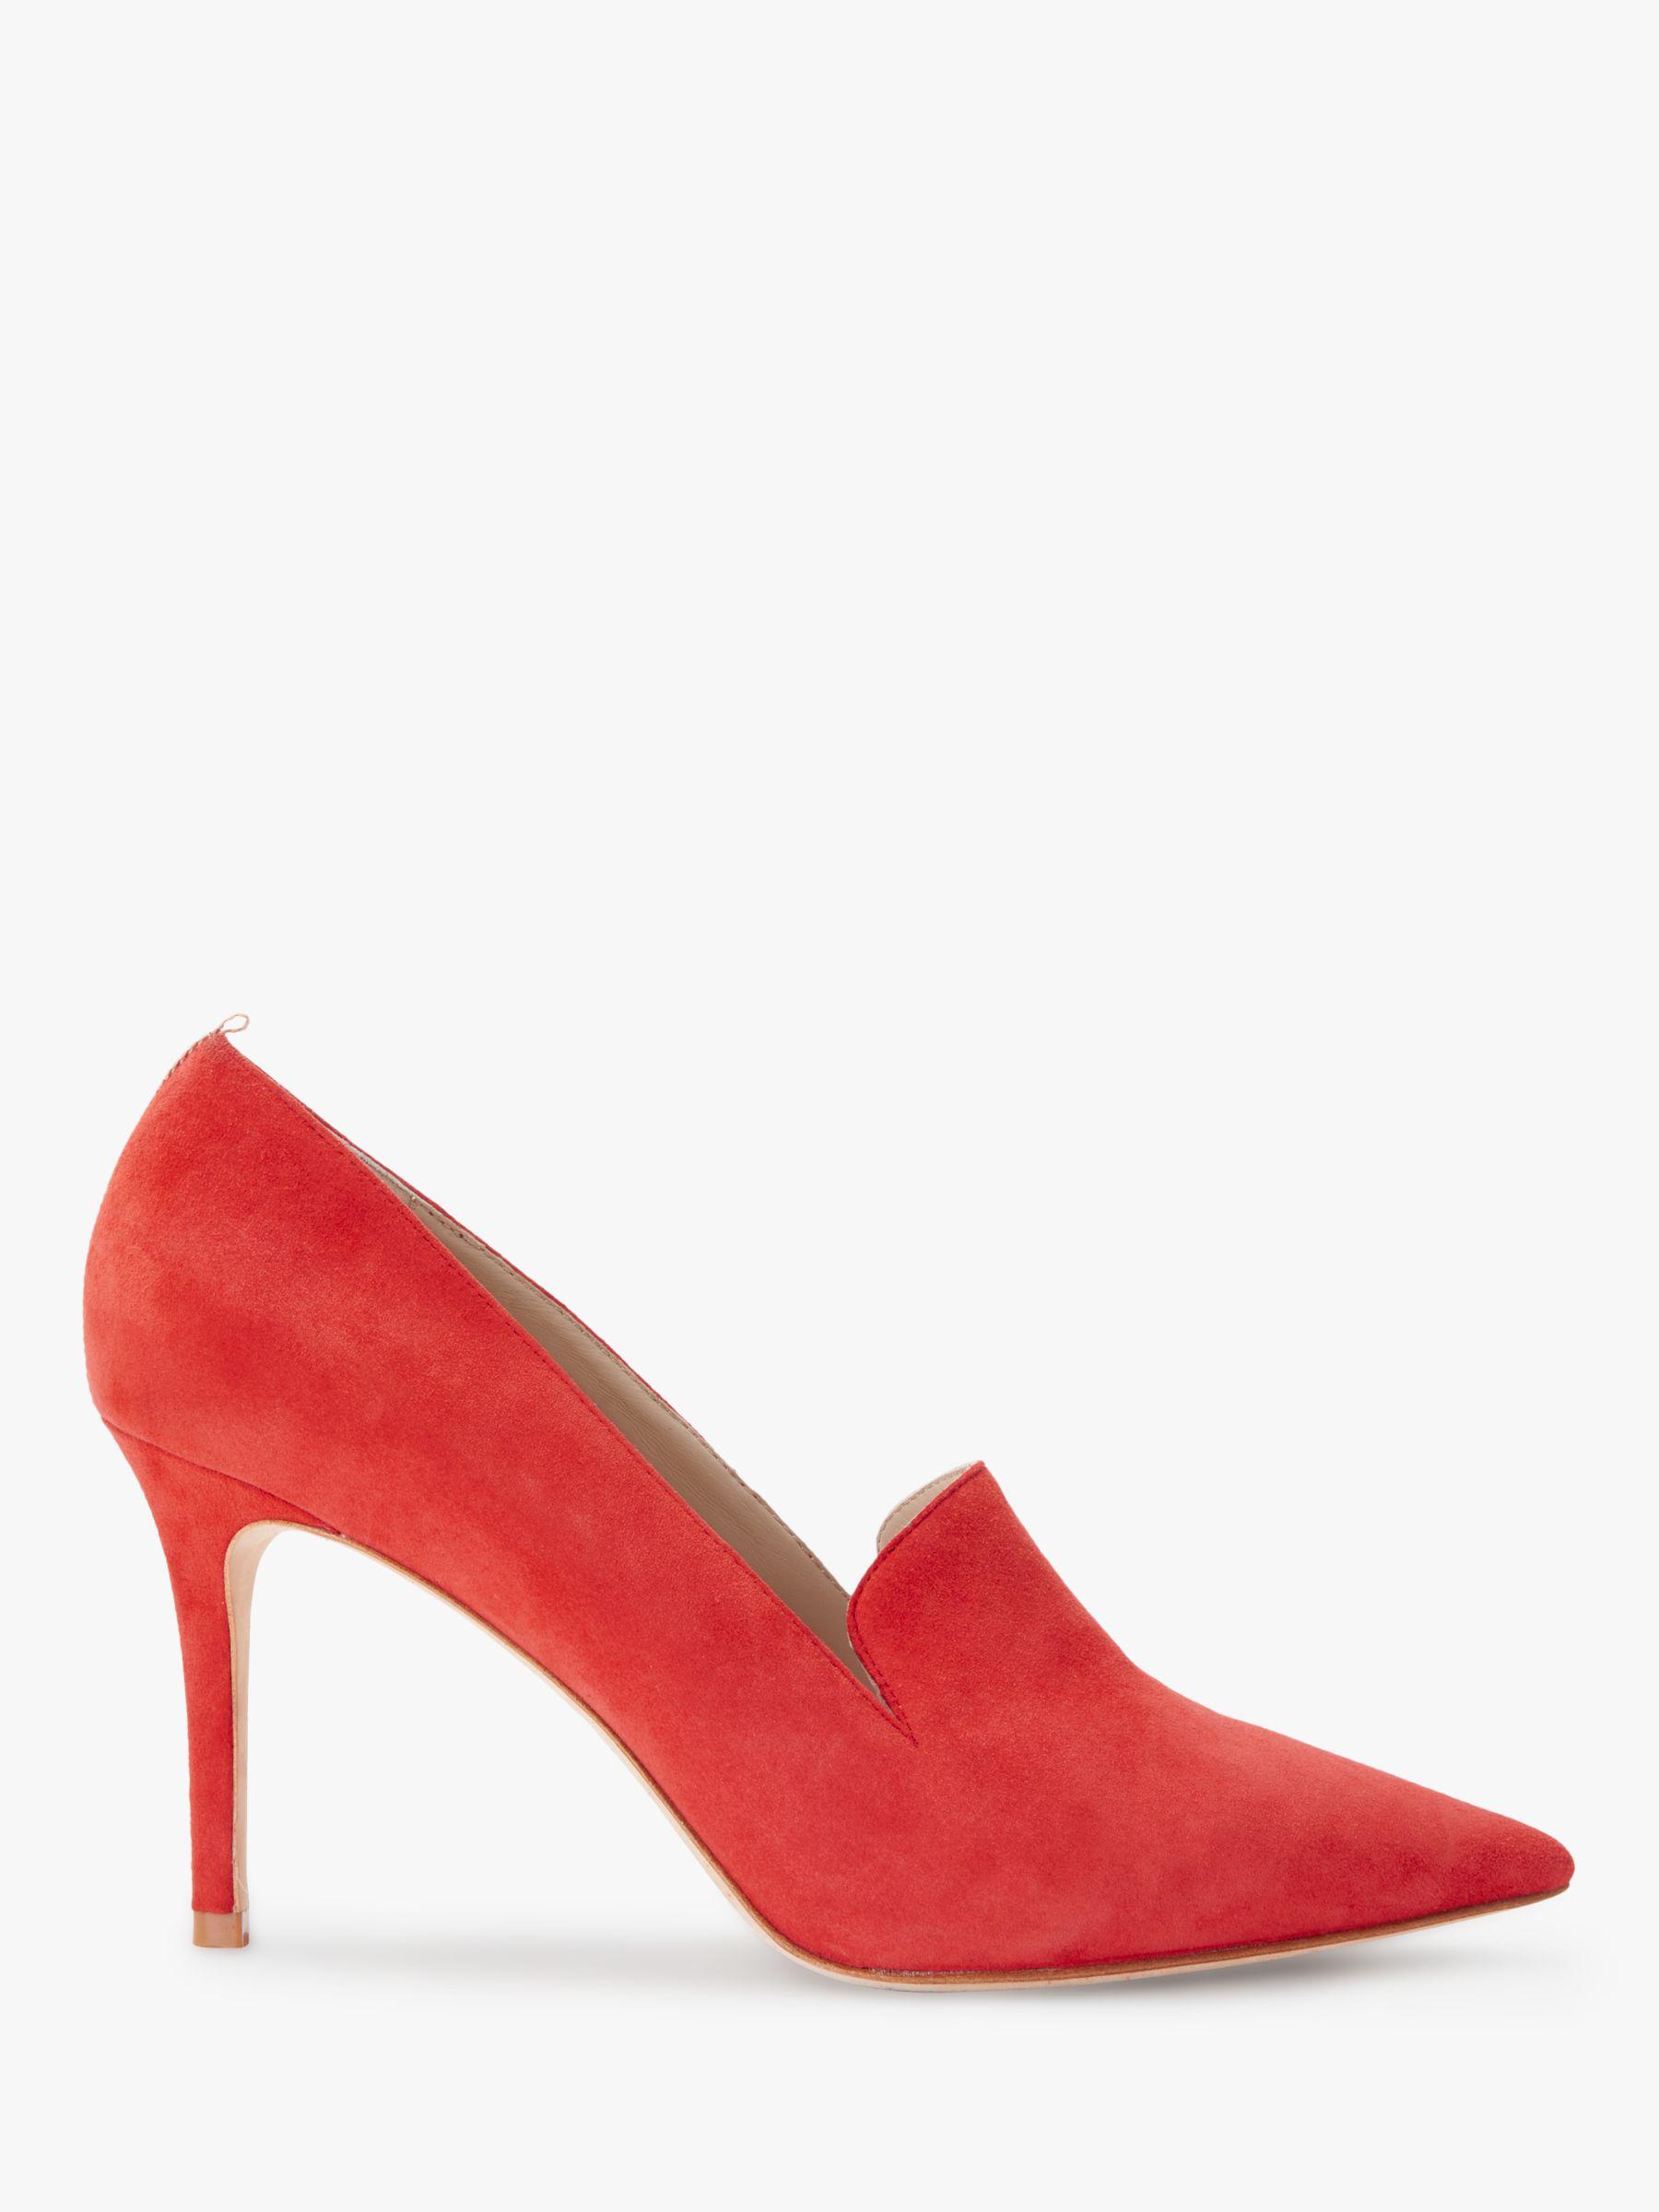 af98aaf6513 Boden Millie Suede Slipper Stiletto Heel Shoes in Red - Lyst